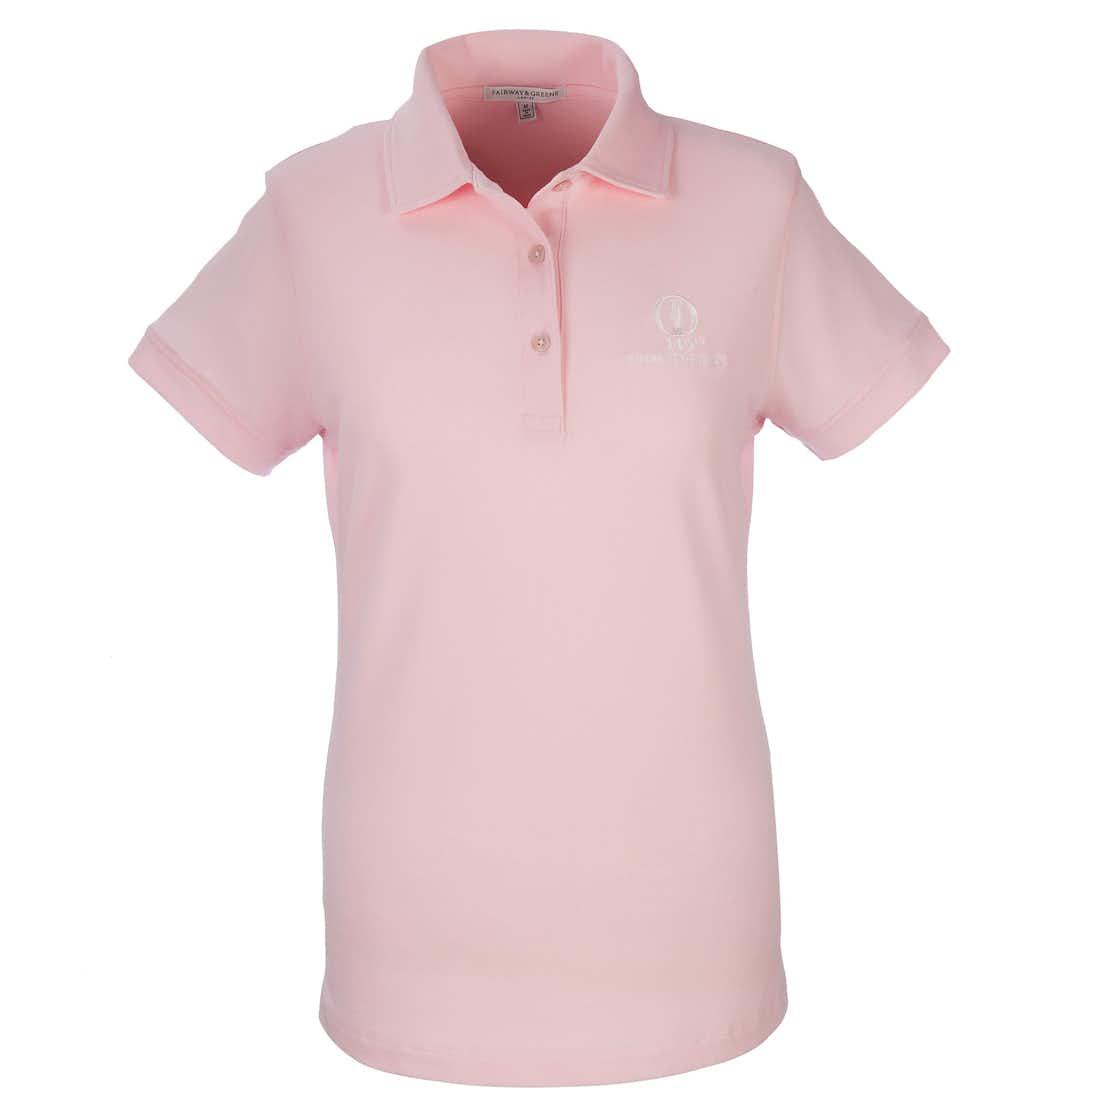 149th Royal St George's Fairway & Greene Plain Polo - Pink